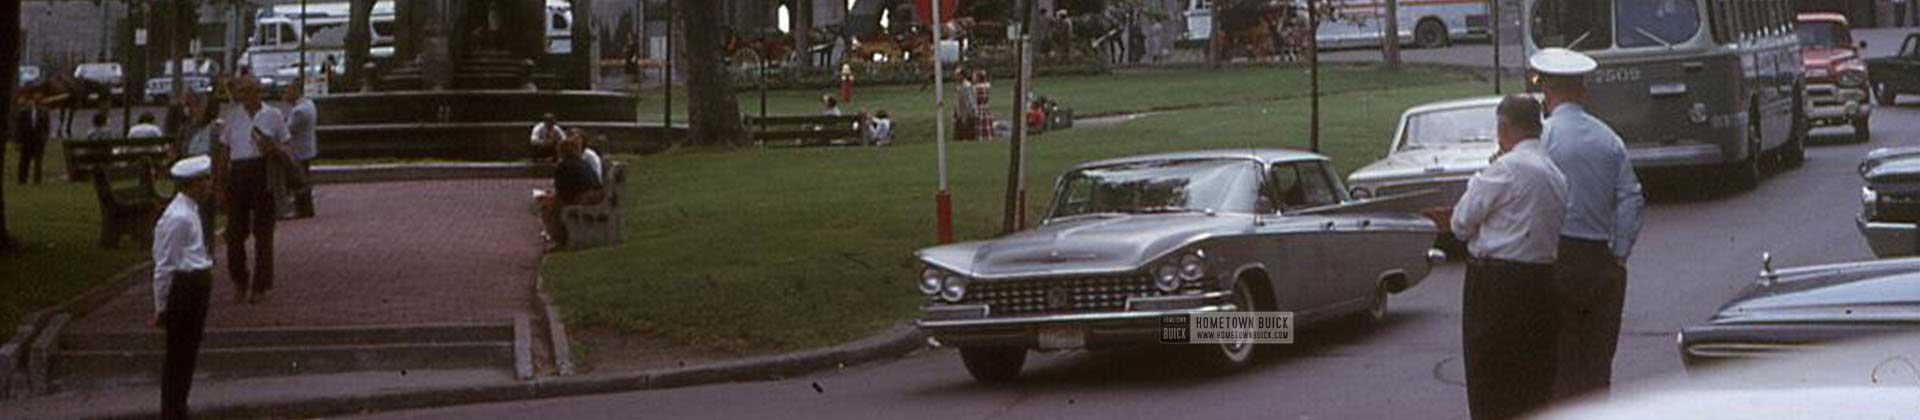 1959 Buick Slider